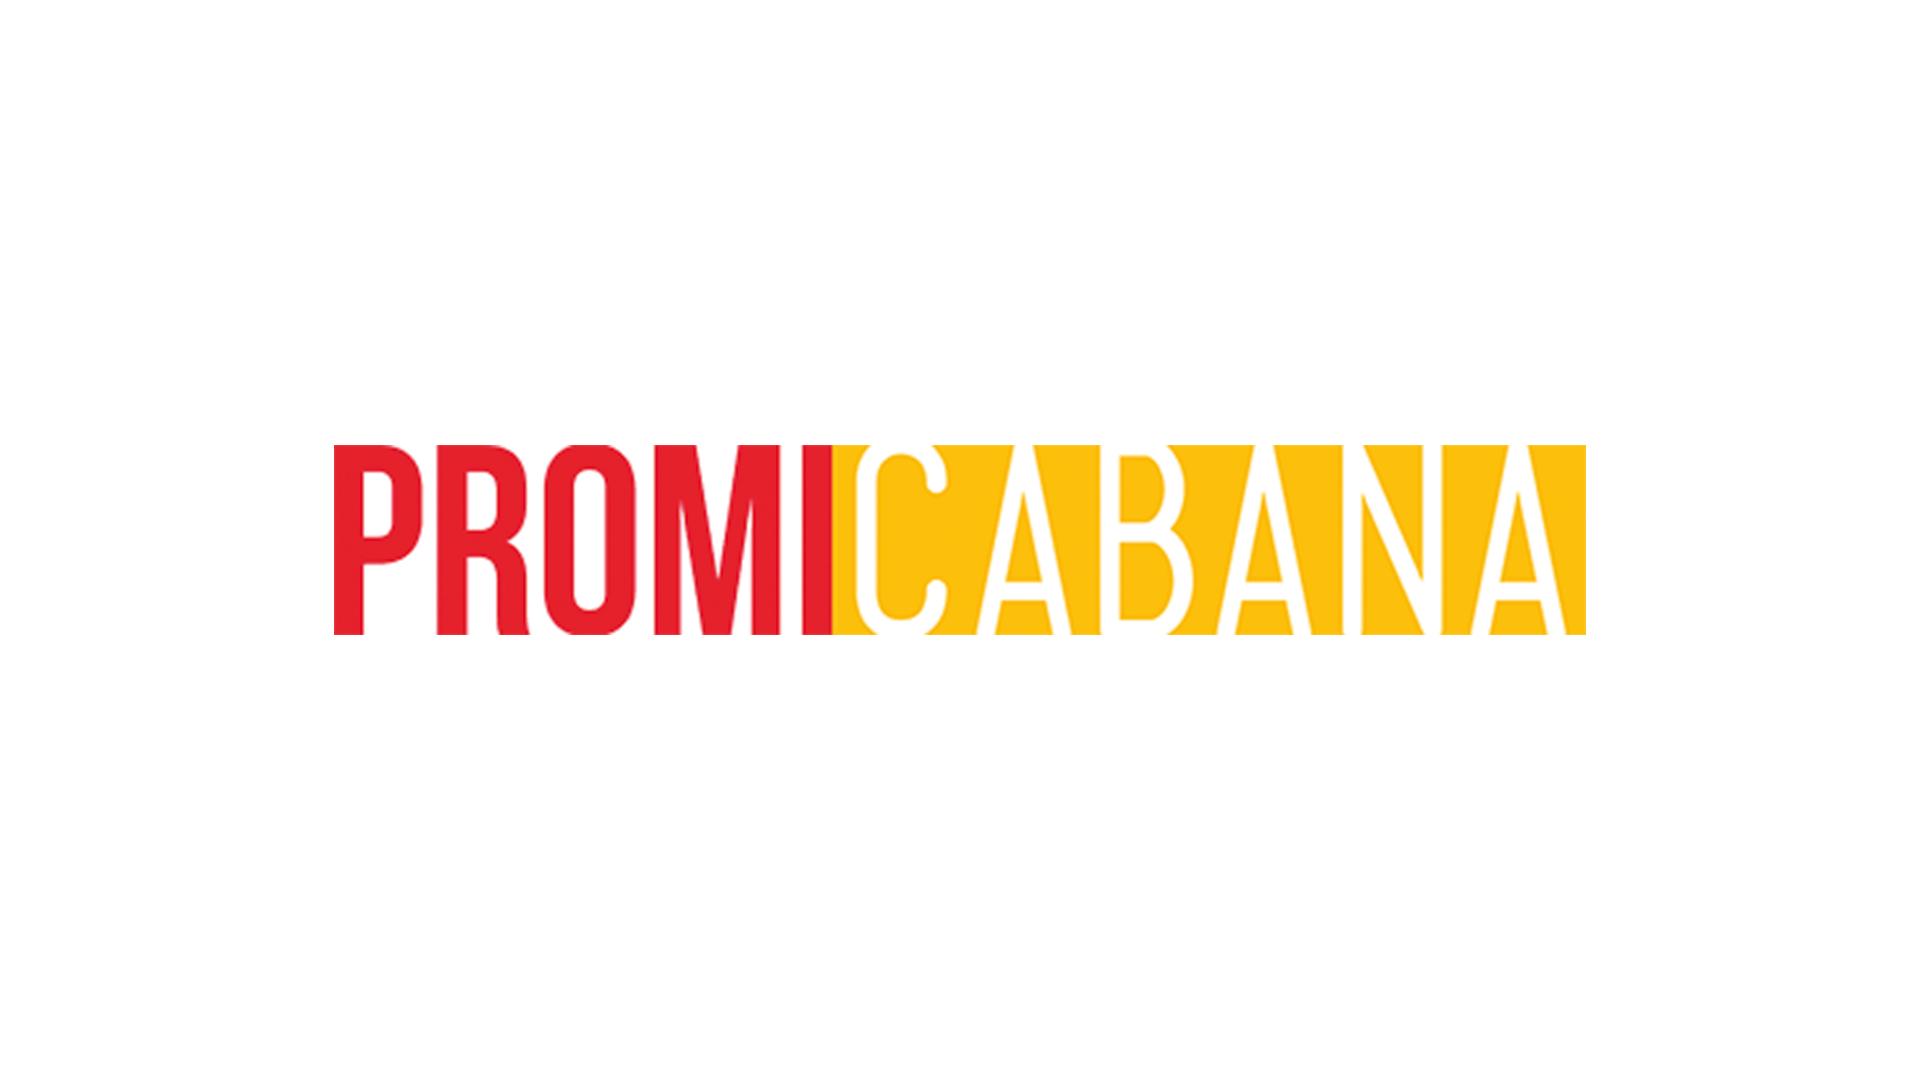 GQ-Most-Stylish-Men-2012-Daniel-Craig-Zac-Efron-Robert-Pattinson